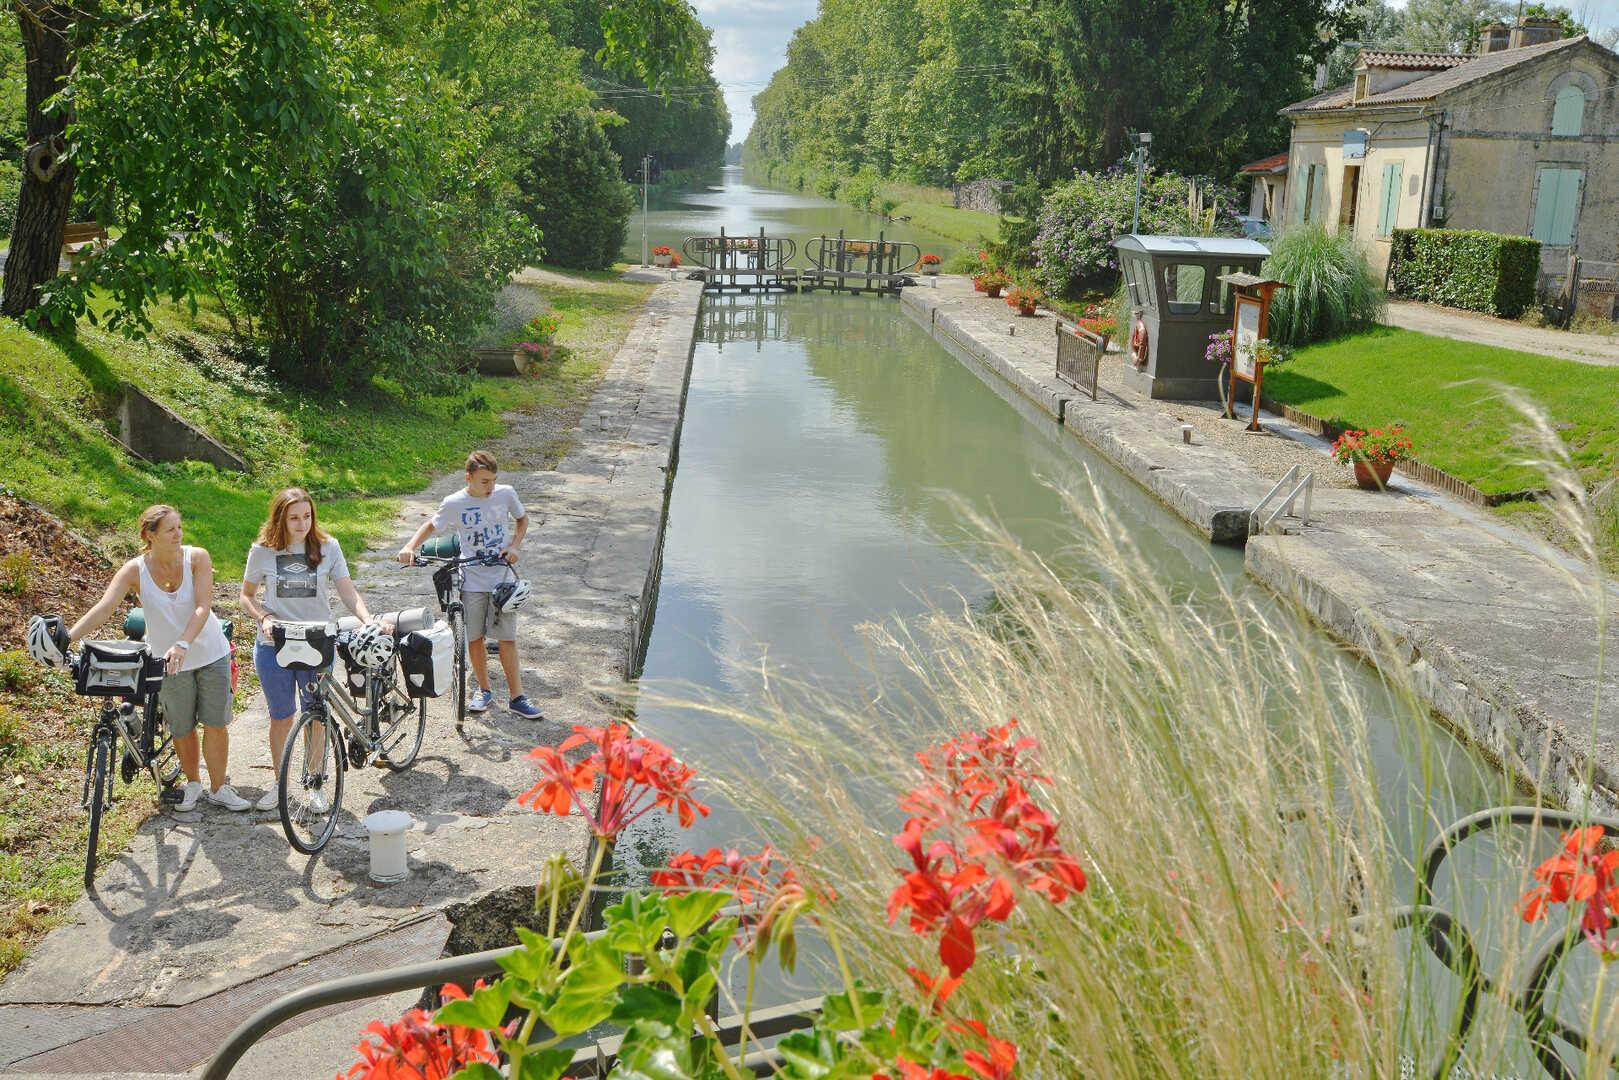 The Canal de Garonne